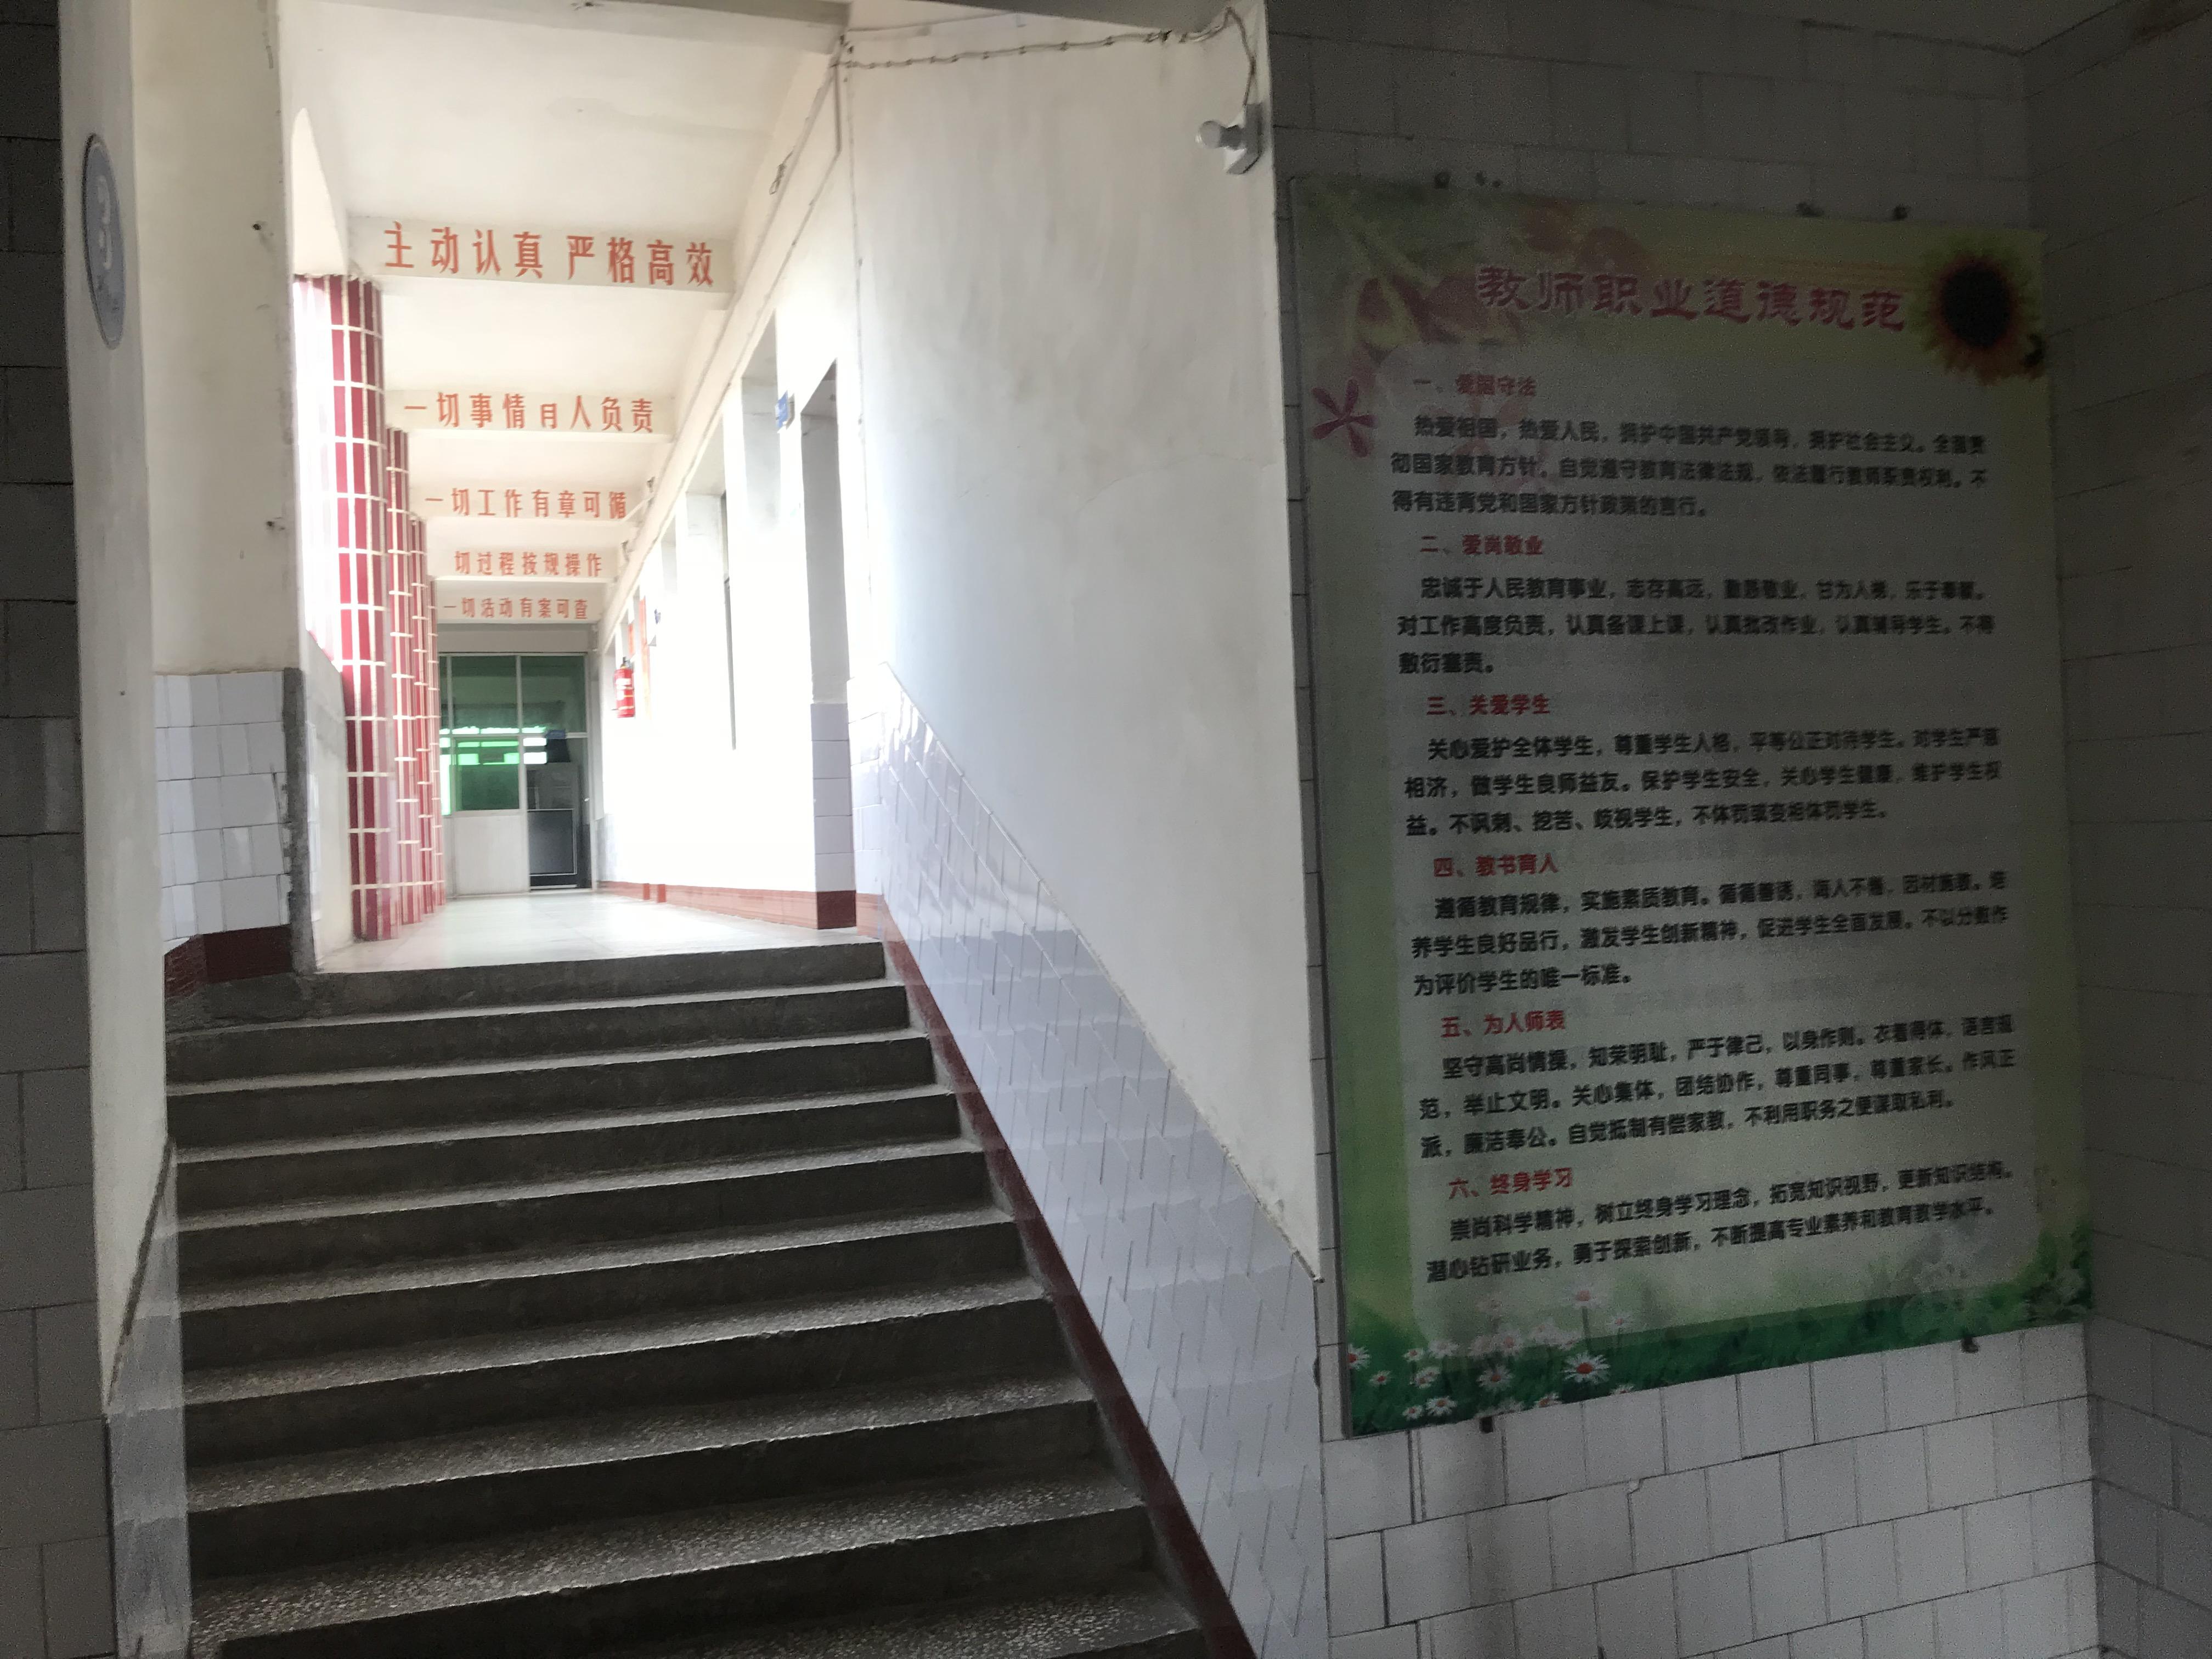 m6电竞市第二小学校园文化建设(图22)